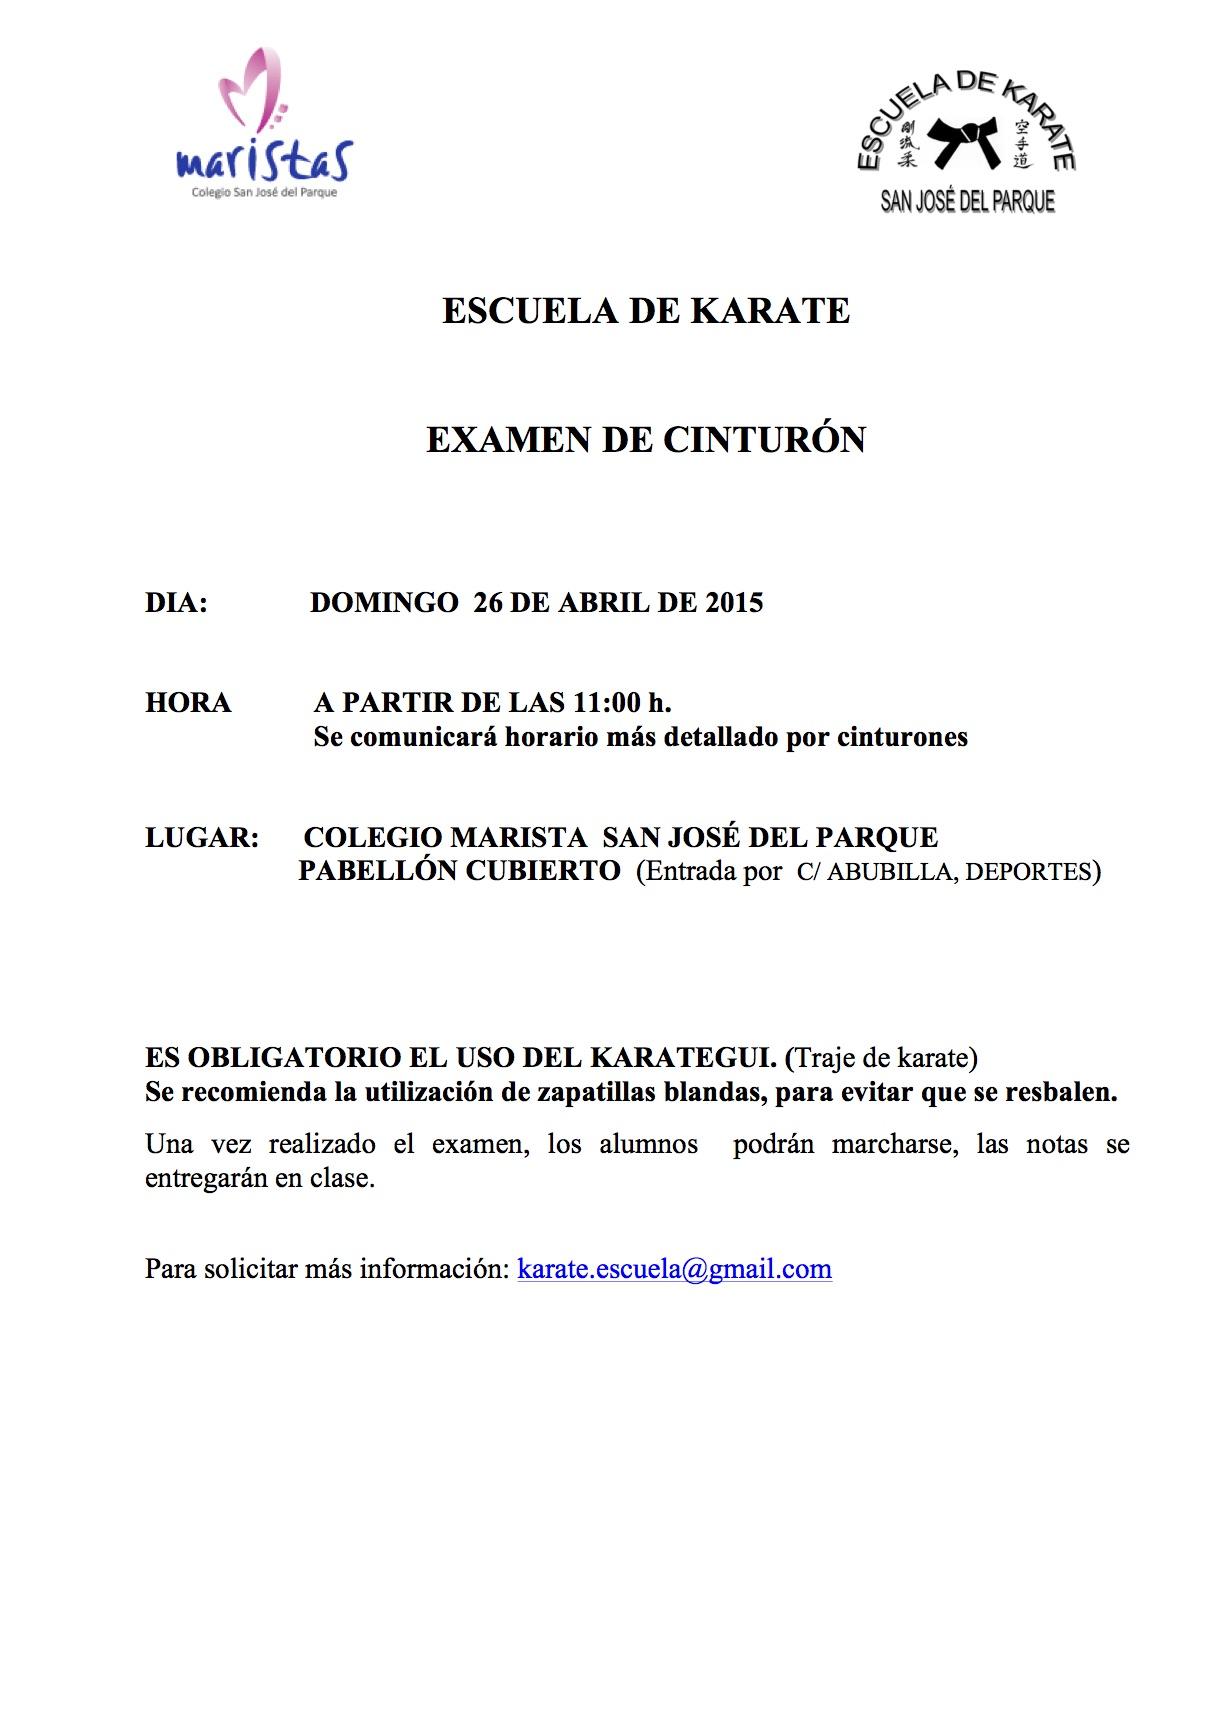 Karate Examen cinturón